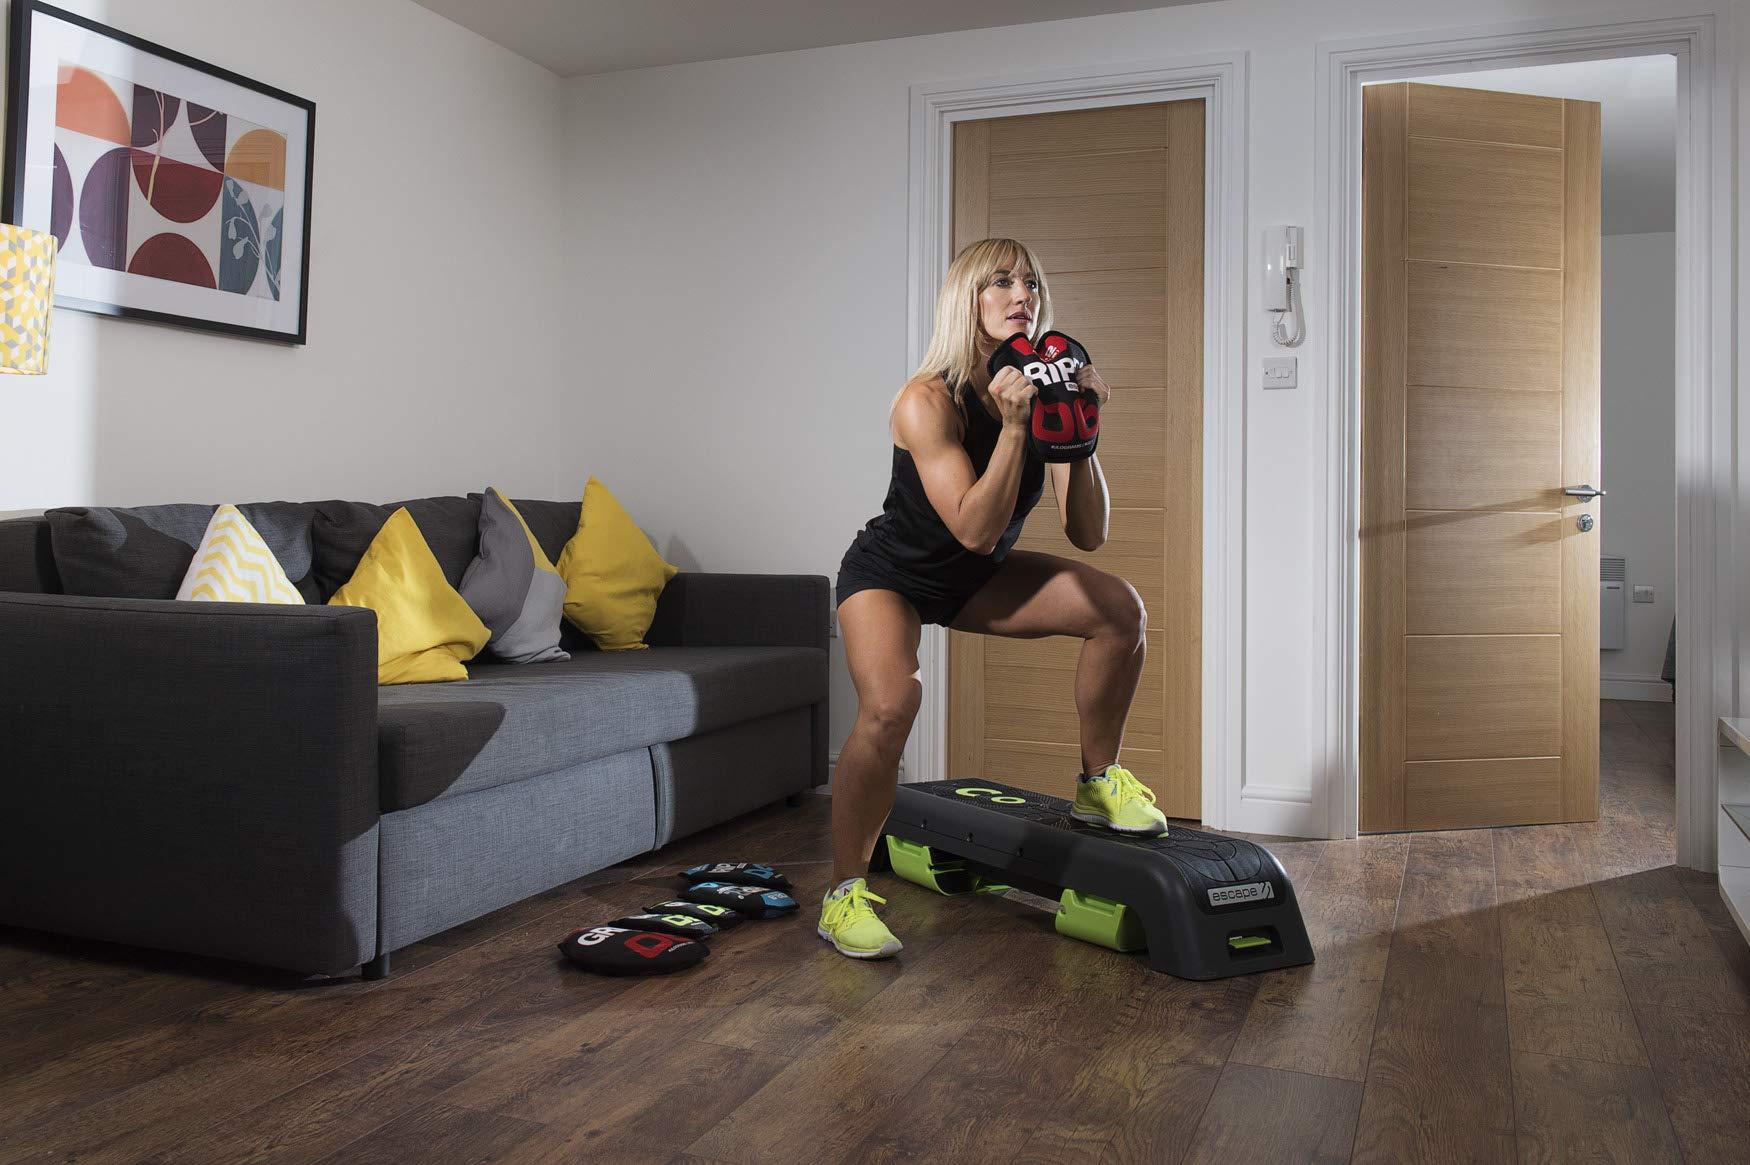 Escape Fitness USA GRIPR - GRIPR Resistance Trainer, Red, 16kg/35lbs